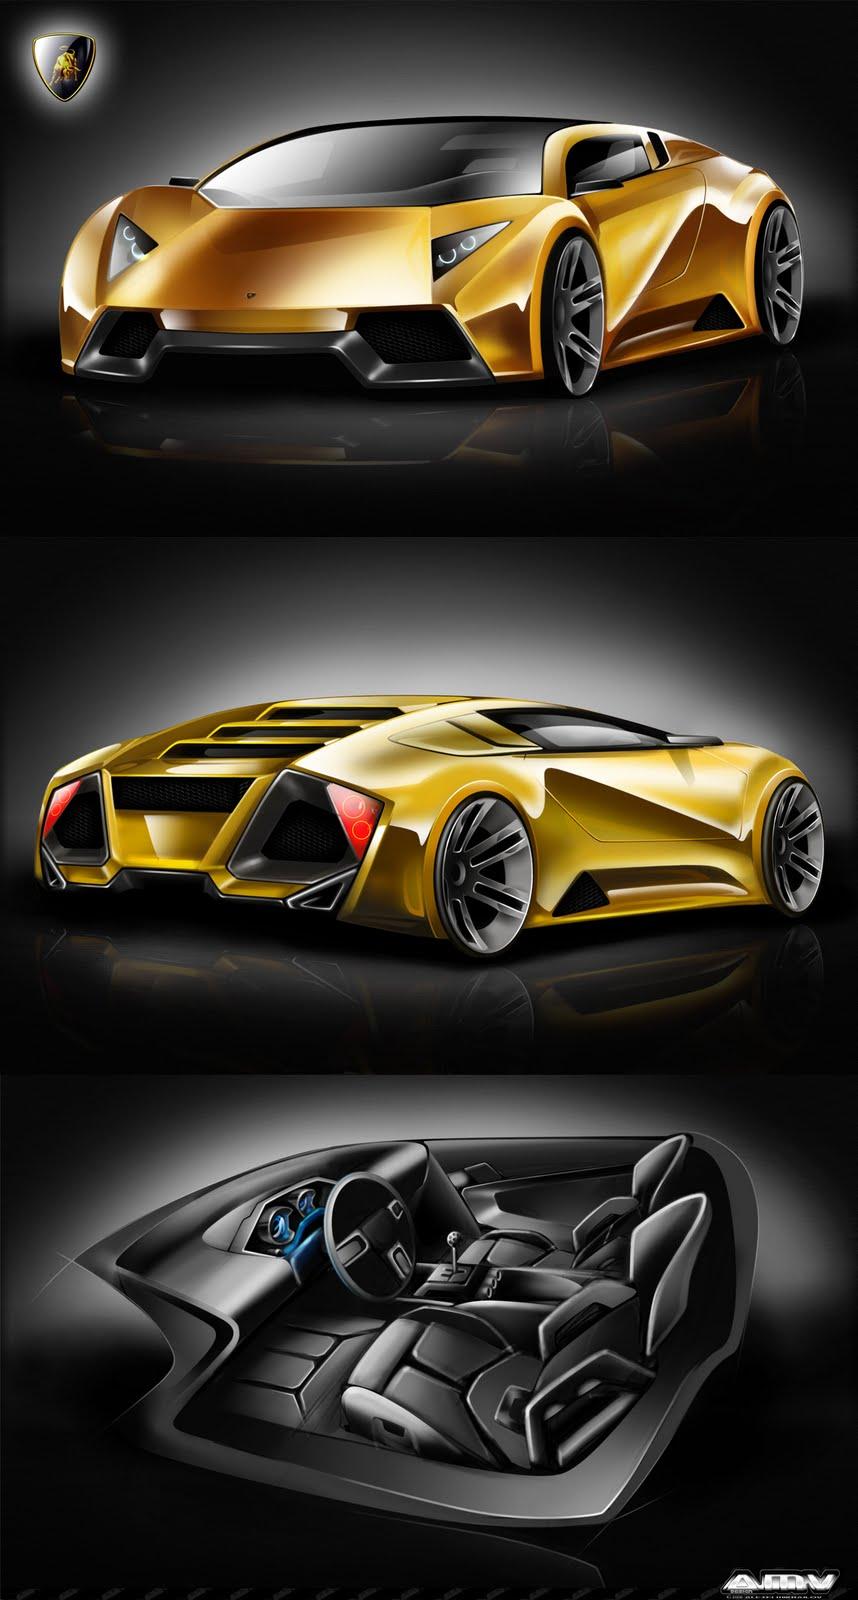 Car Concept Wallpaper 2010 Awesome Design Lvldoom Lyrics